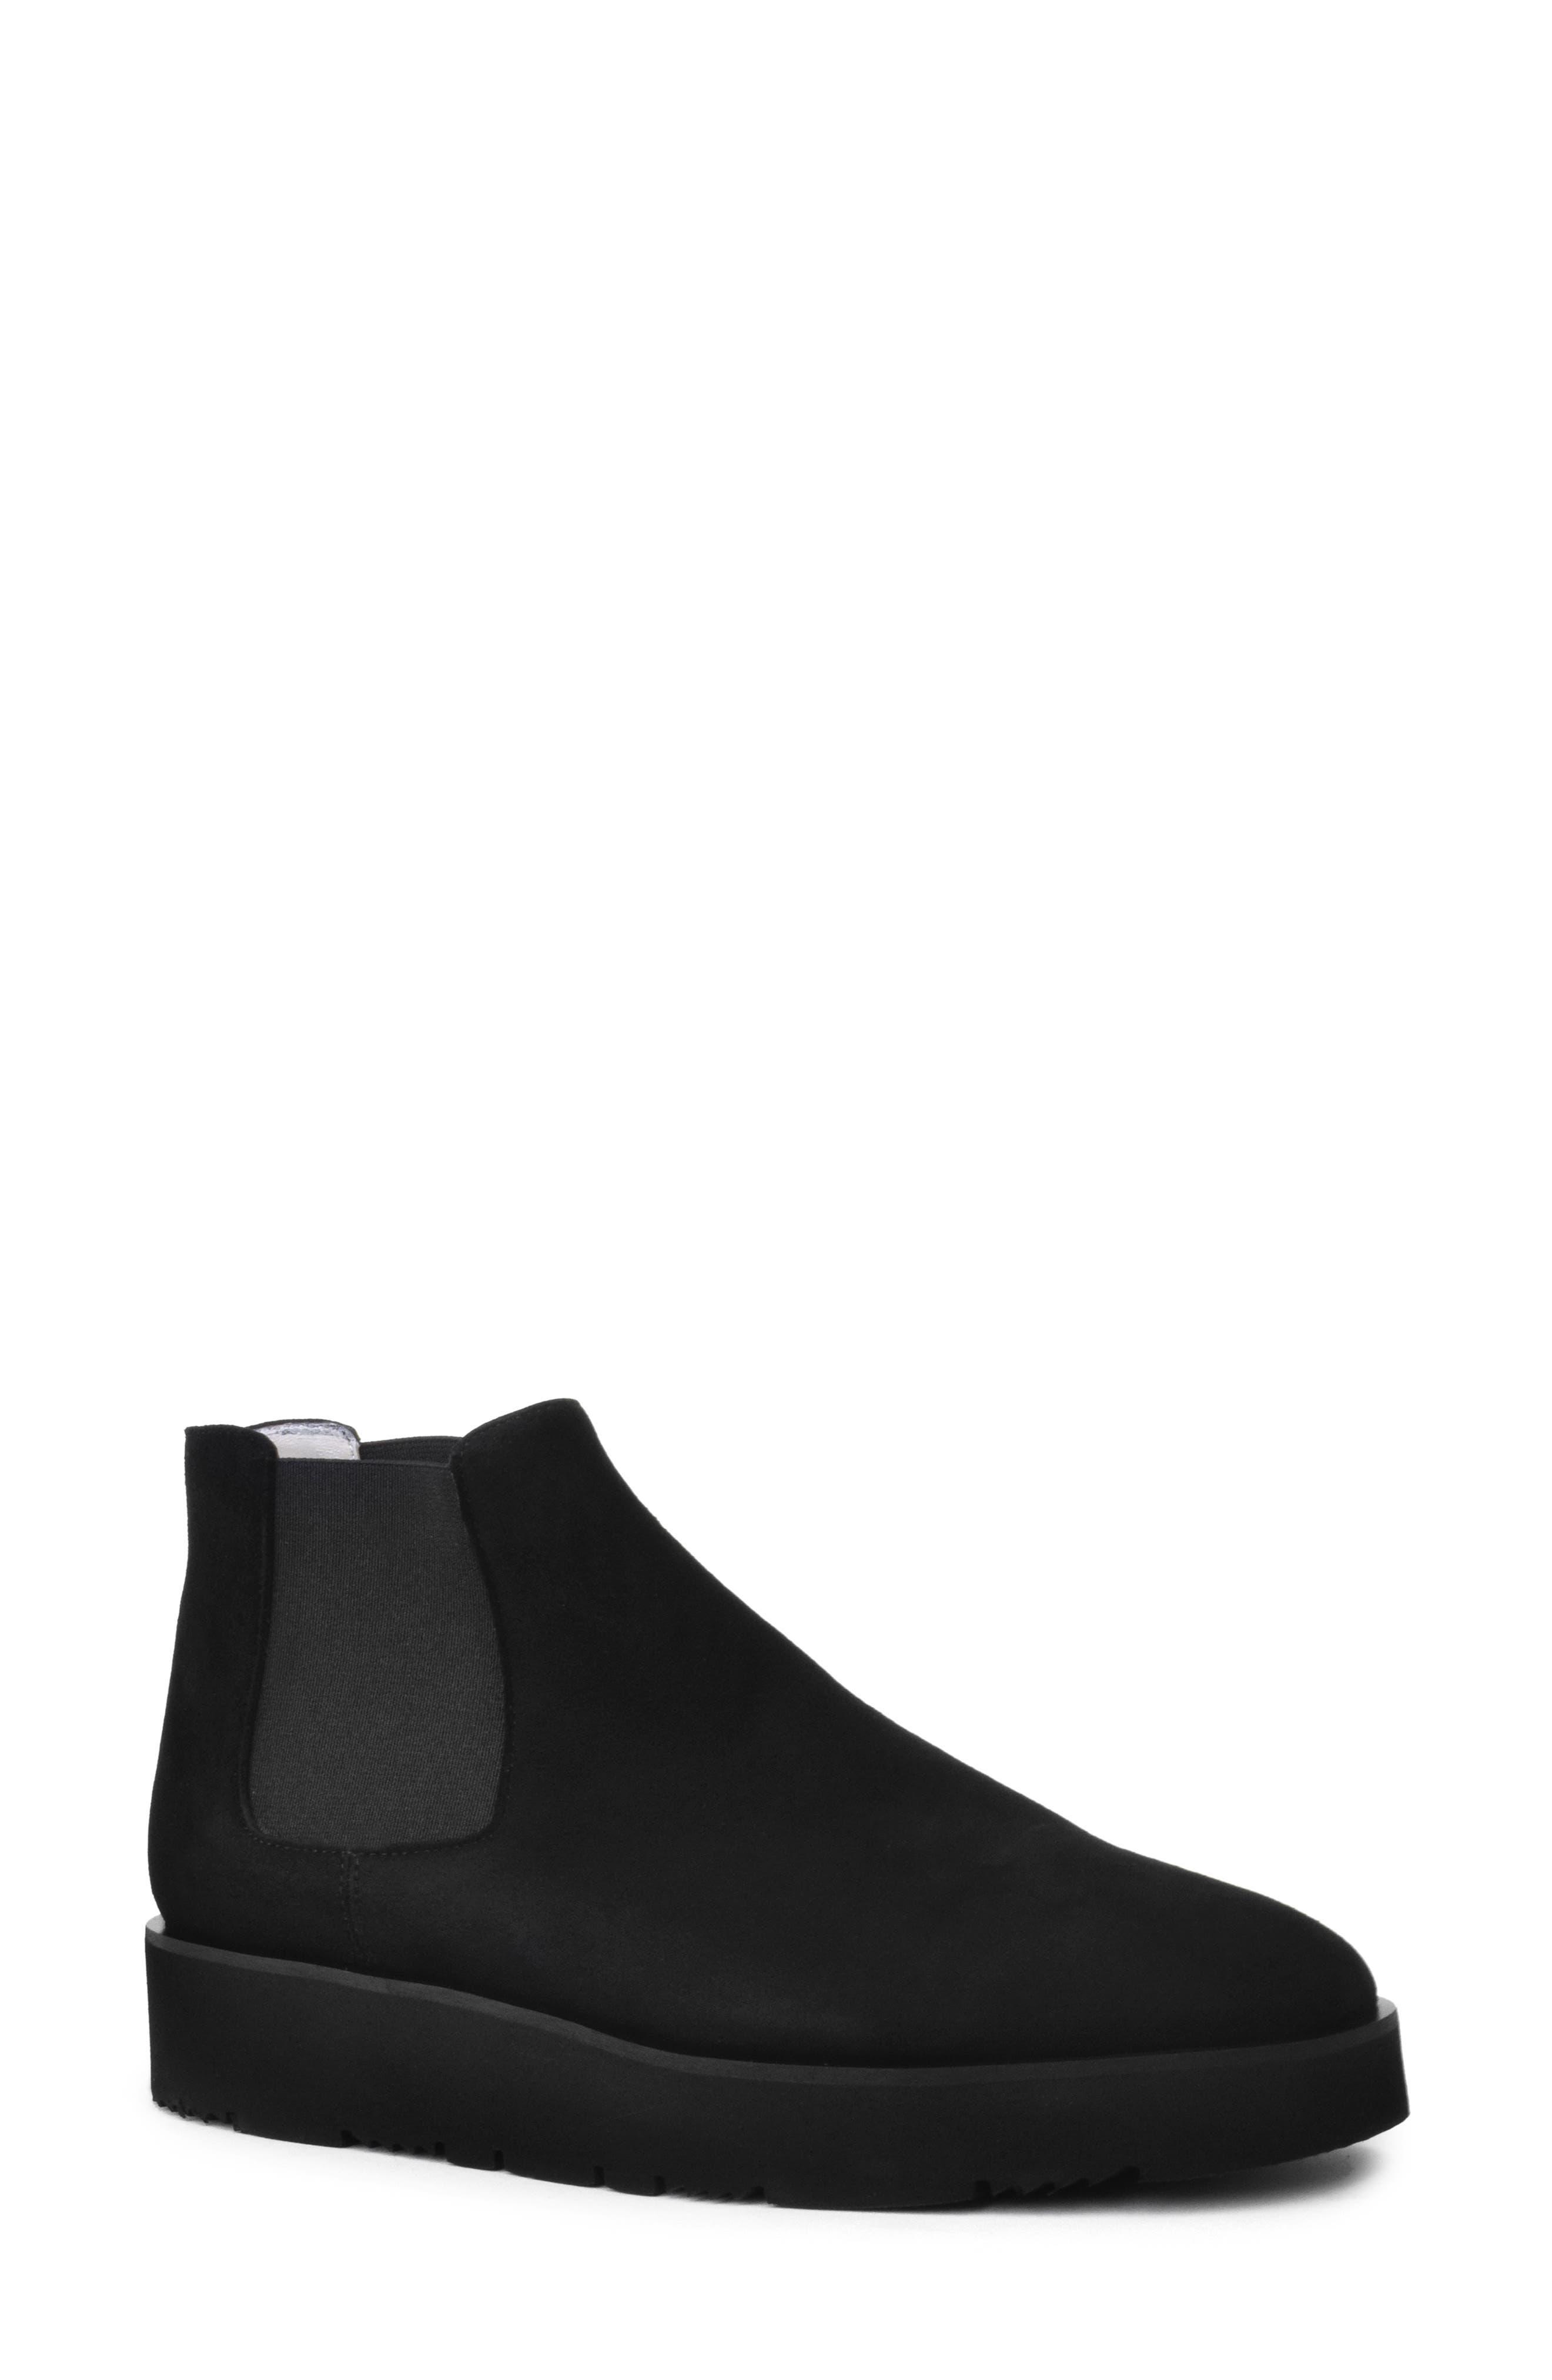 Enrico Chelsea Boot